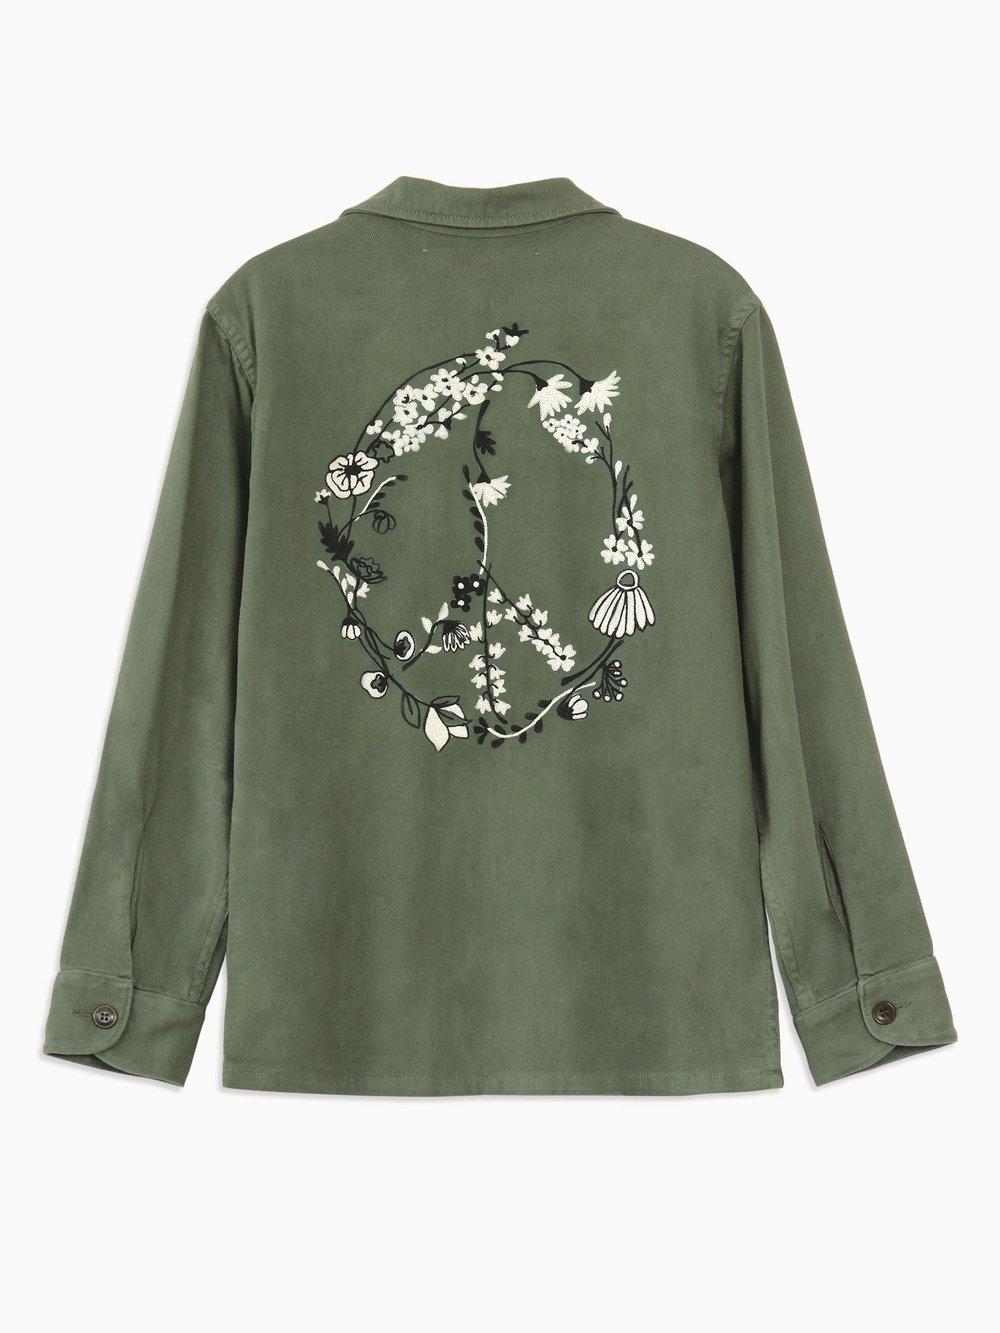 Sweet Flower Army Jacket.jpg